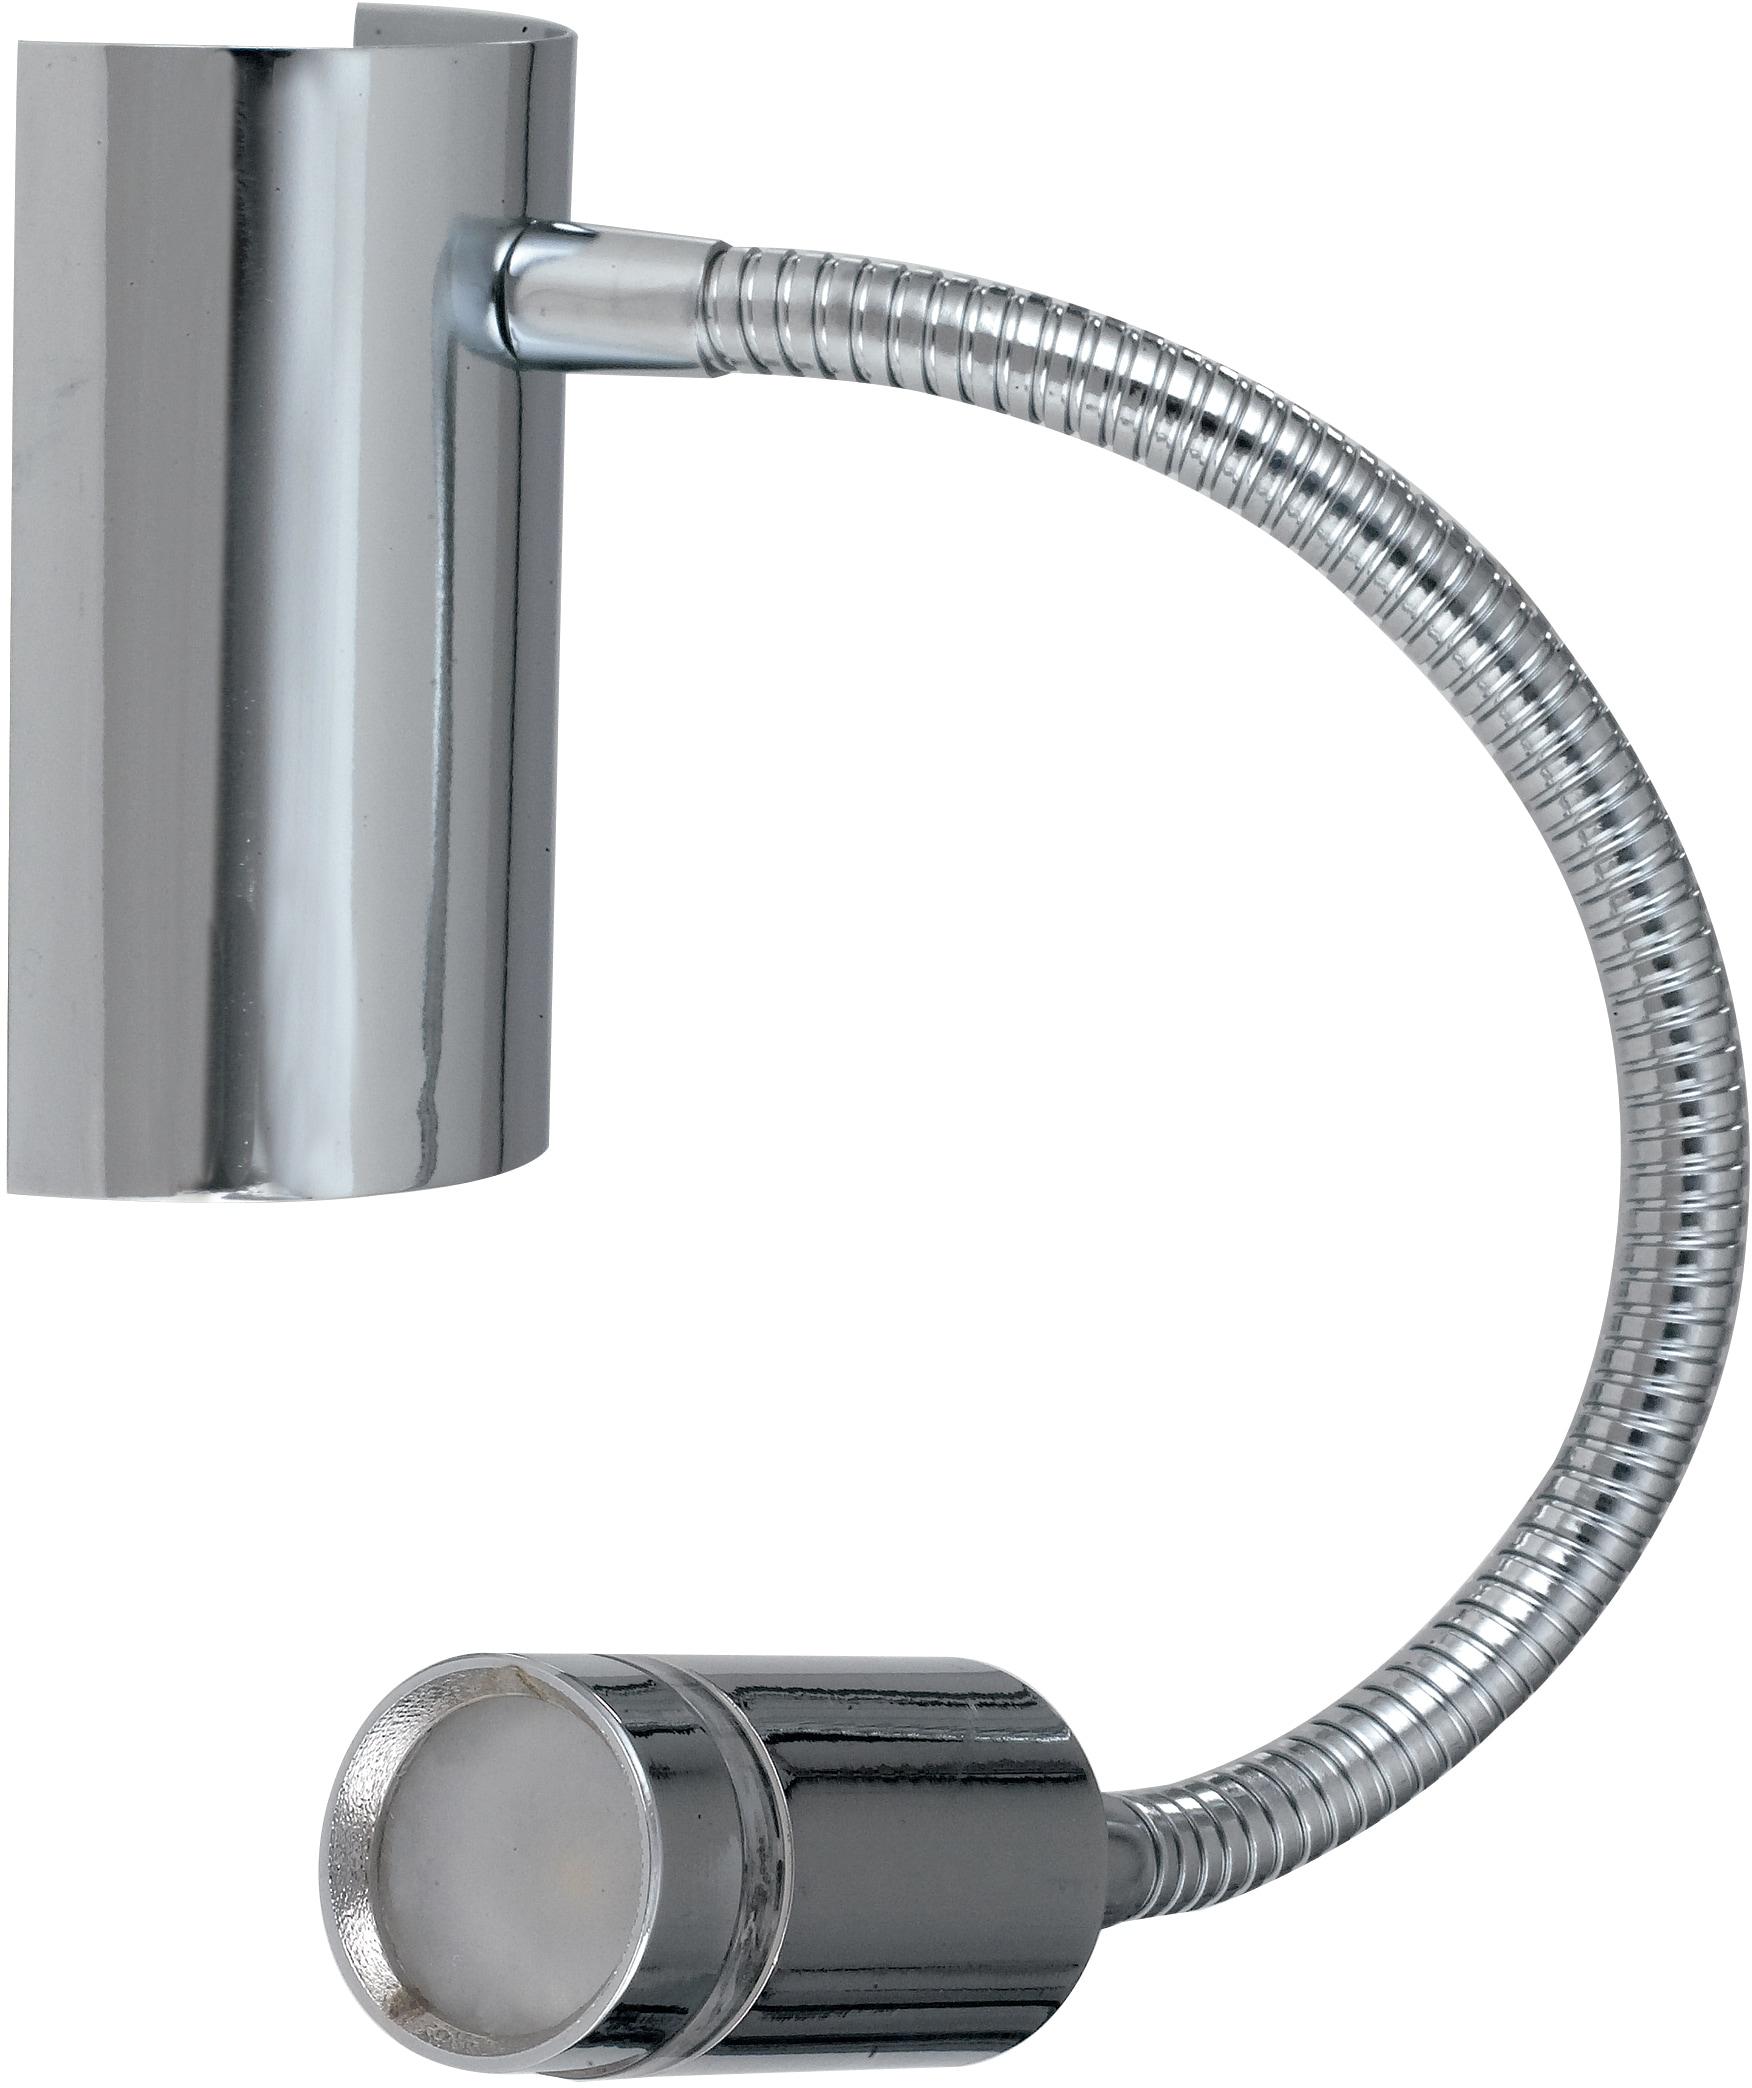 LUCE Design LED Wandleuchte LED-KEPLER-CR, LED-Modul, 1 St., Warmweiß